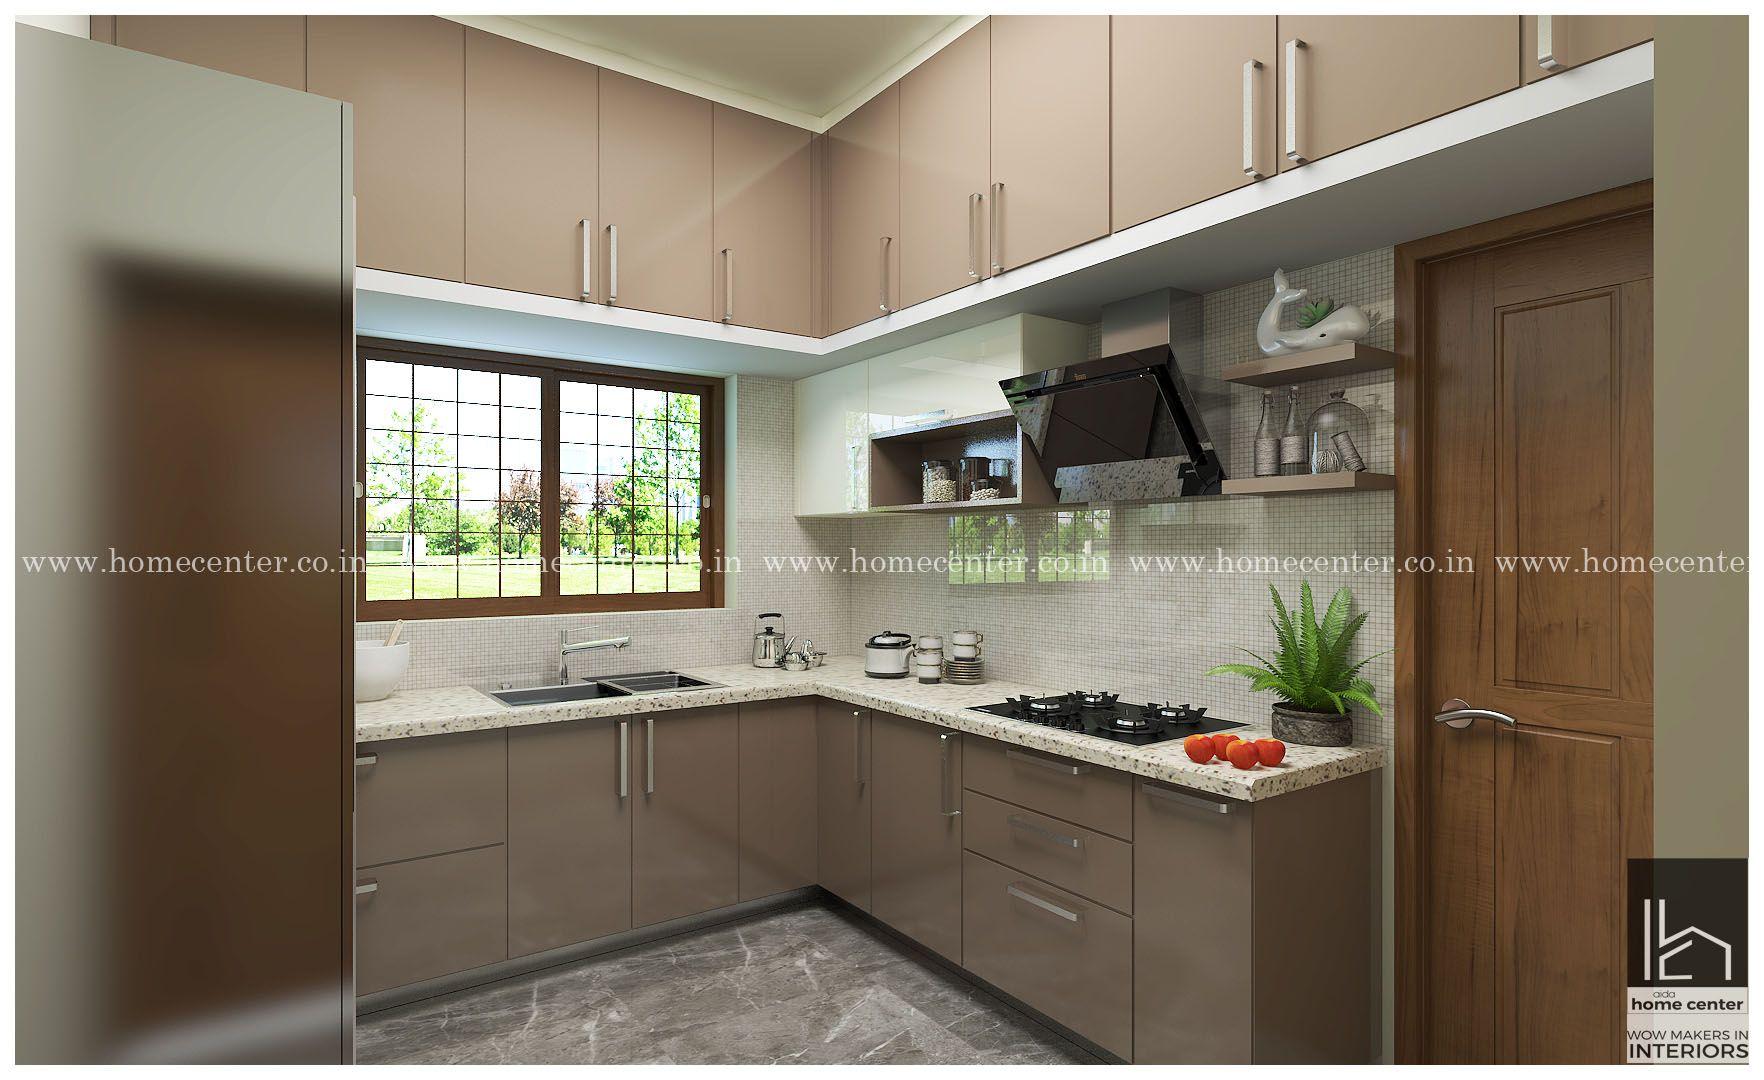 Modular Kitchen designers in kerala Home center